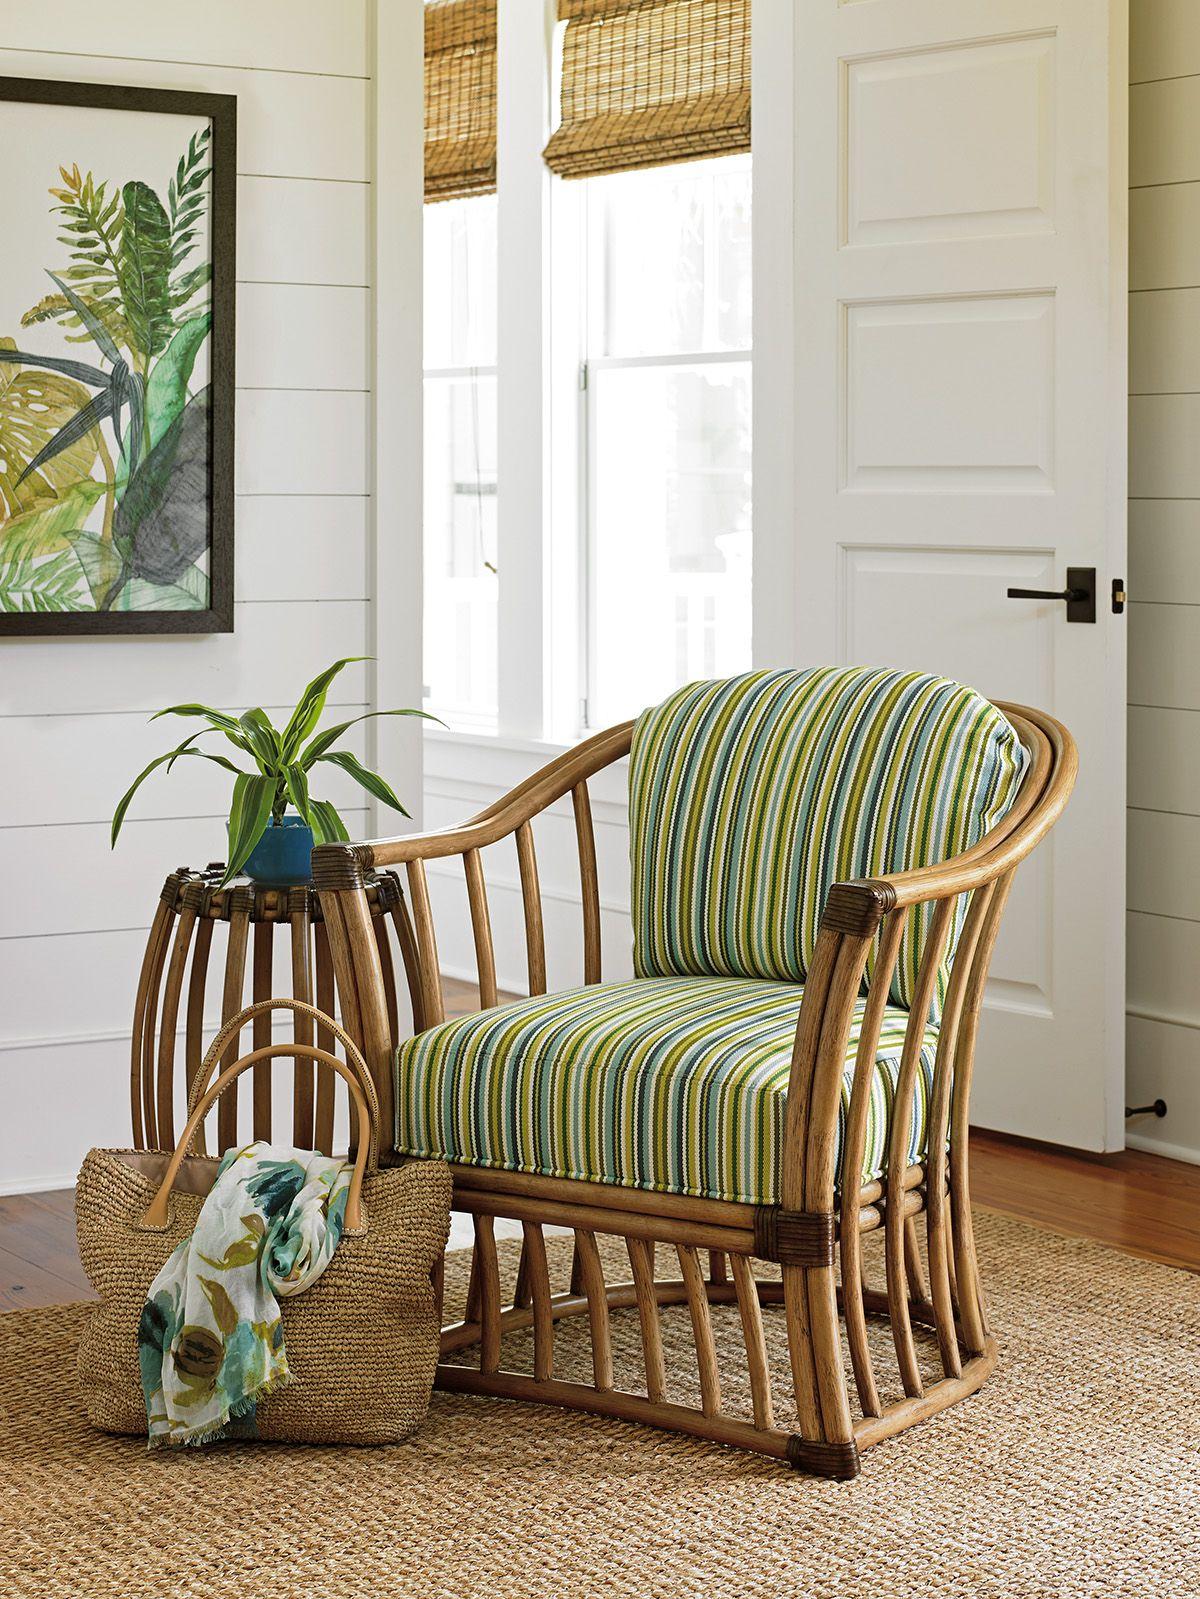 Tropical Accent Chair greenandwhite coastalfurniture